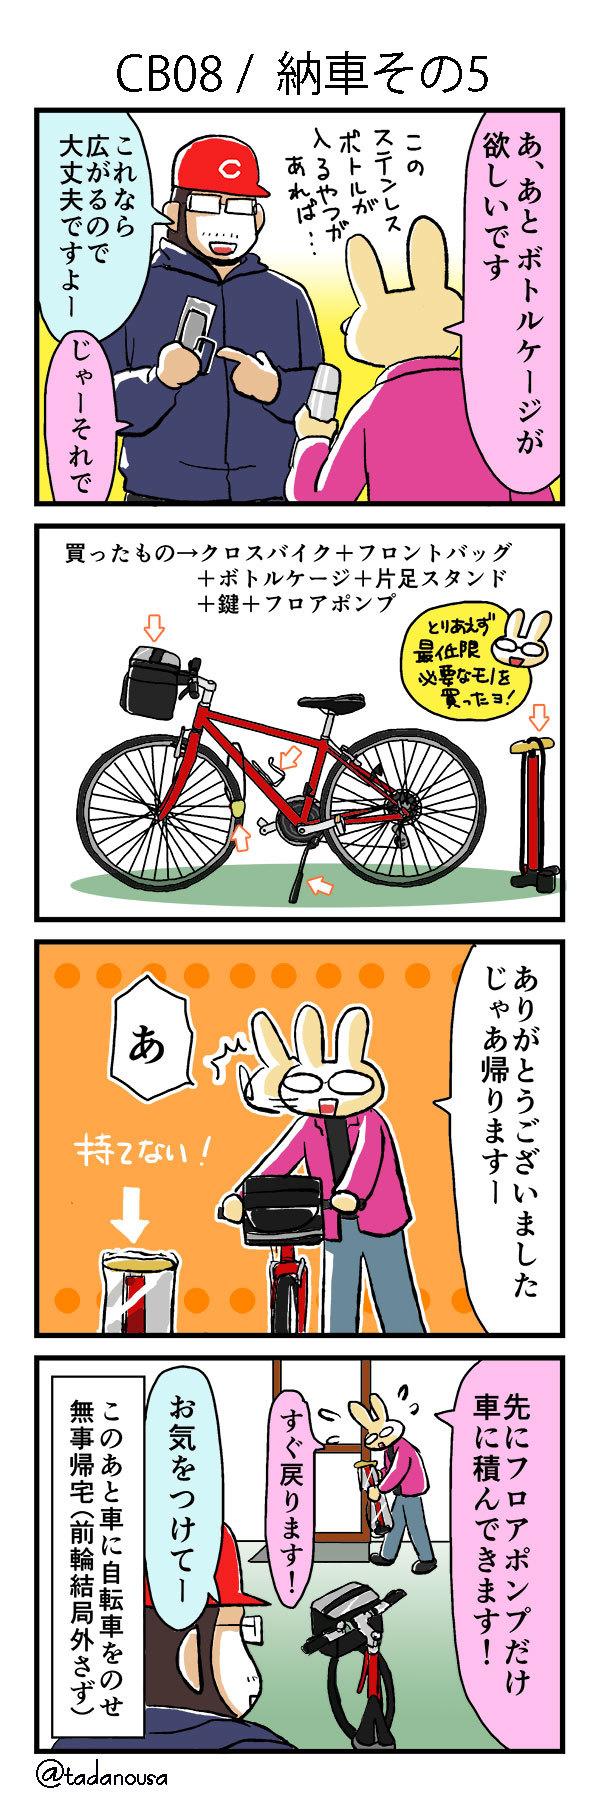 bike_4koma_kako048_s.jpg